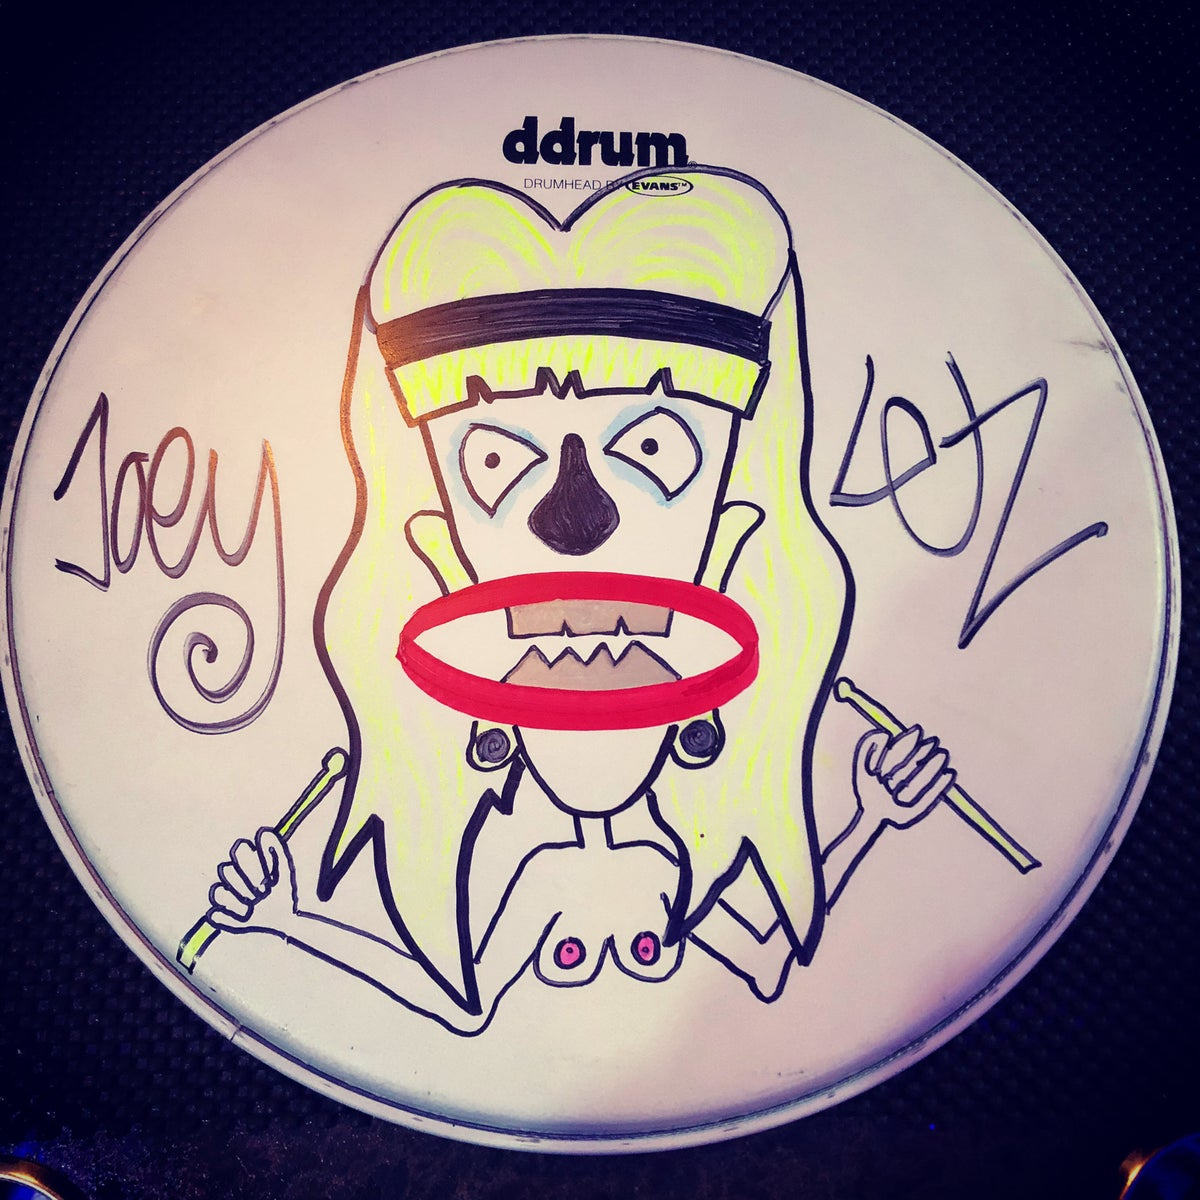 Image of personalized, custom drum head by Joe Letz